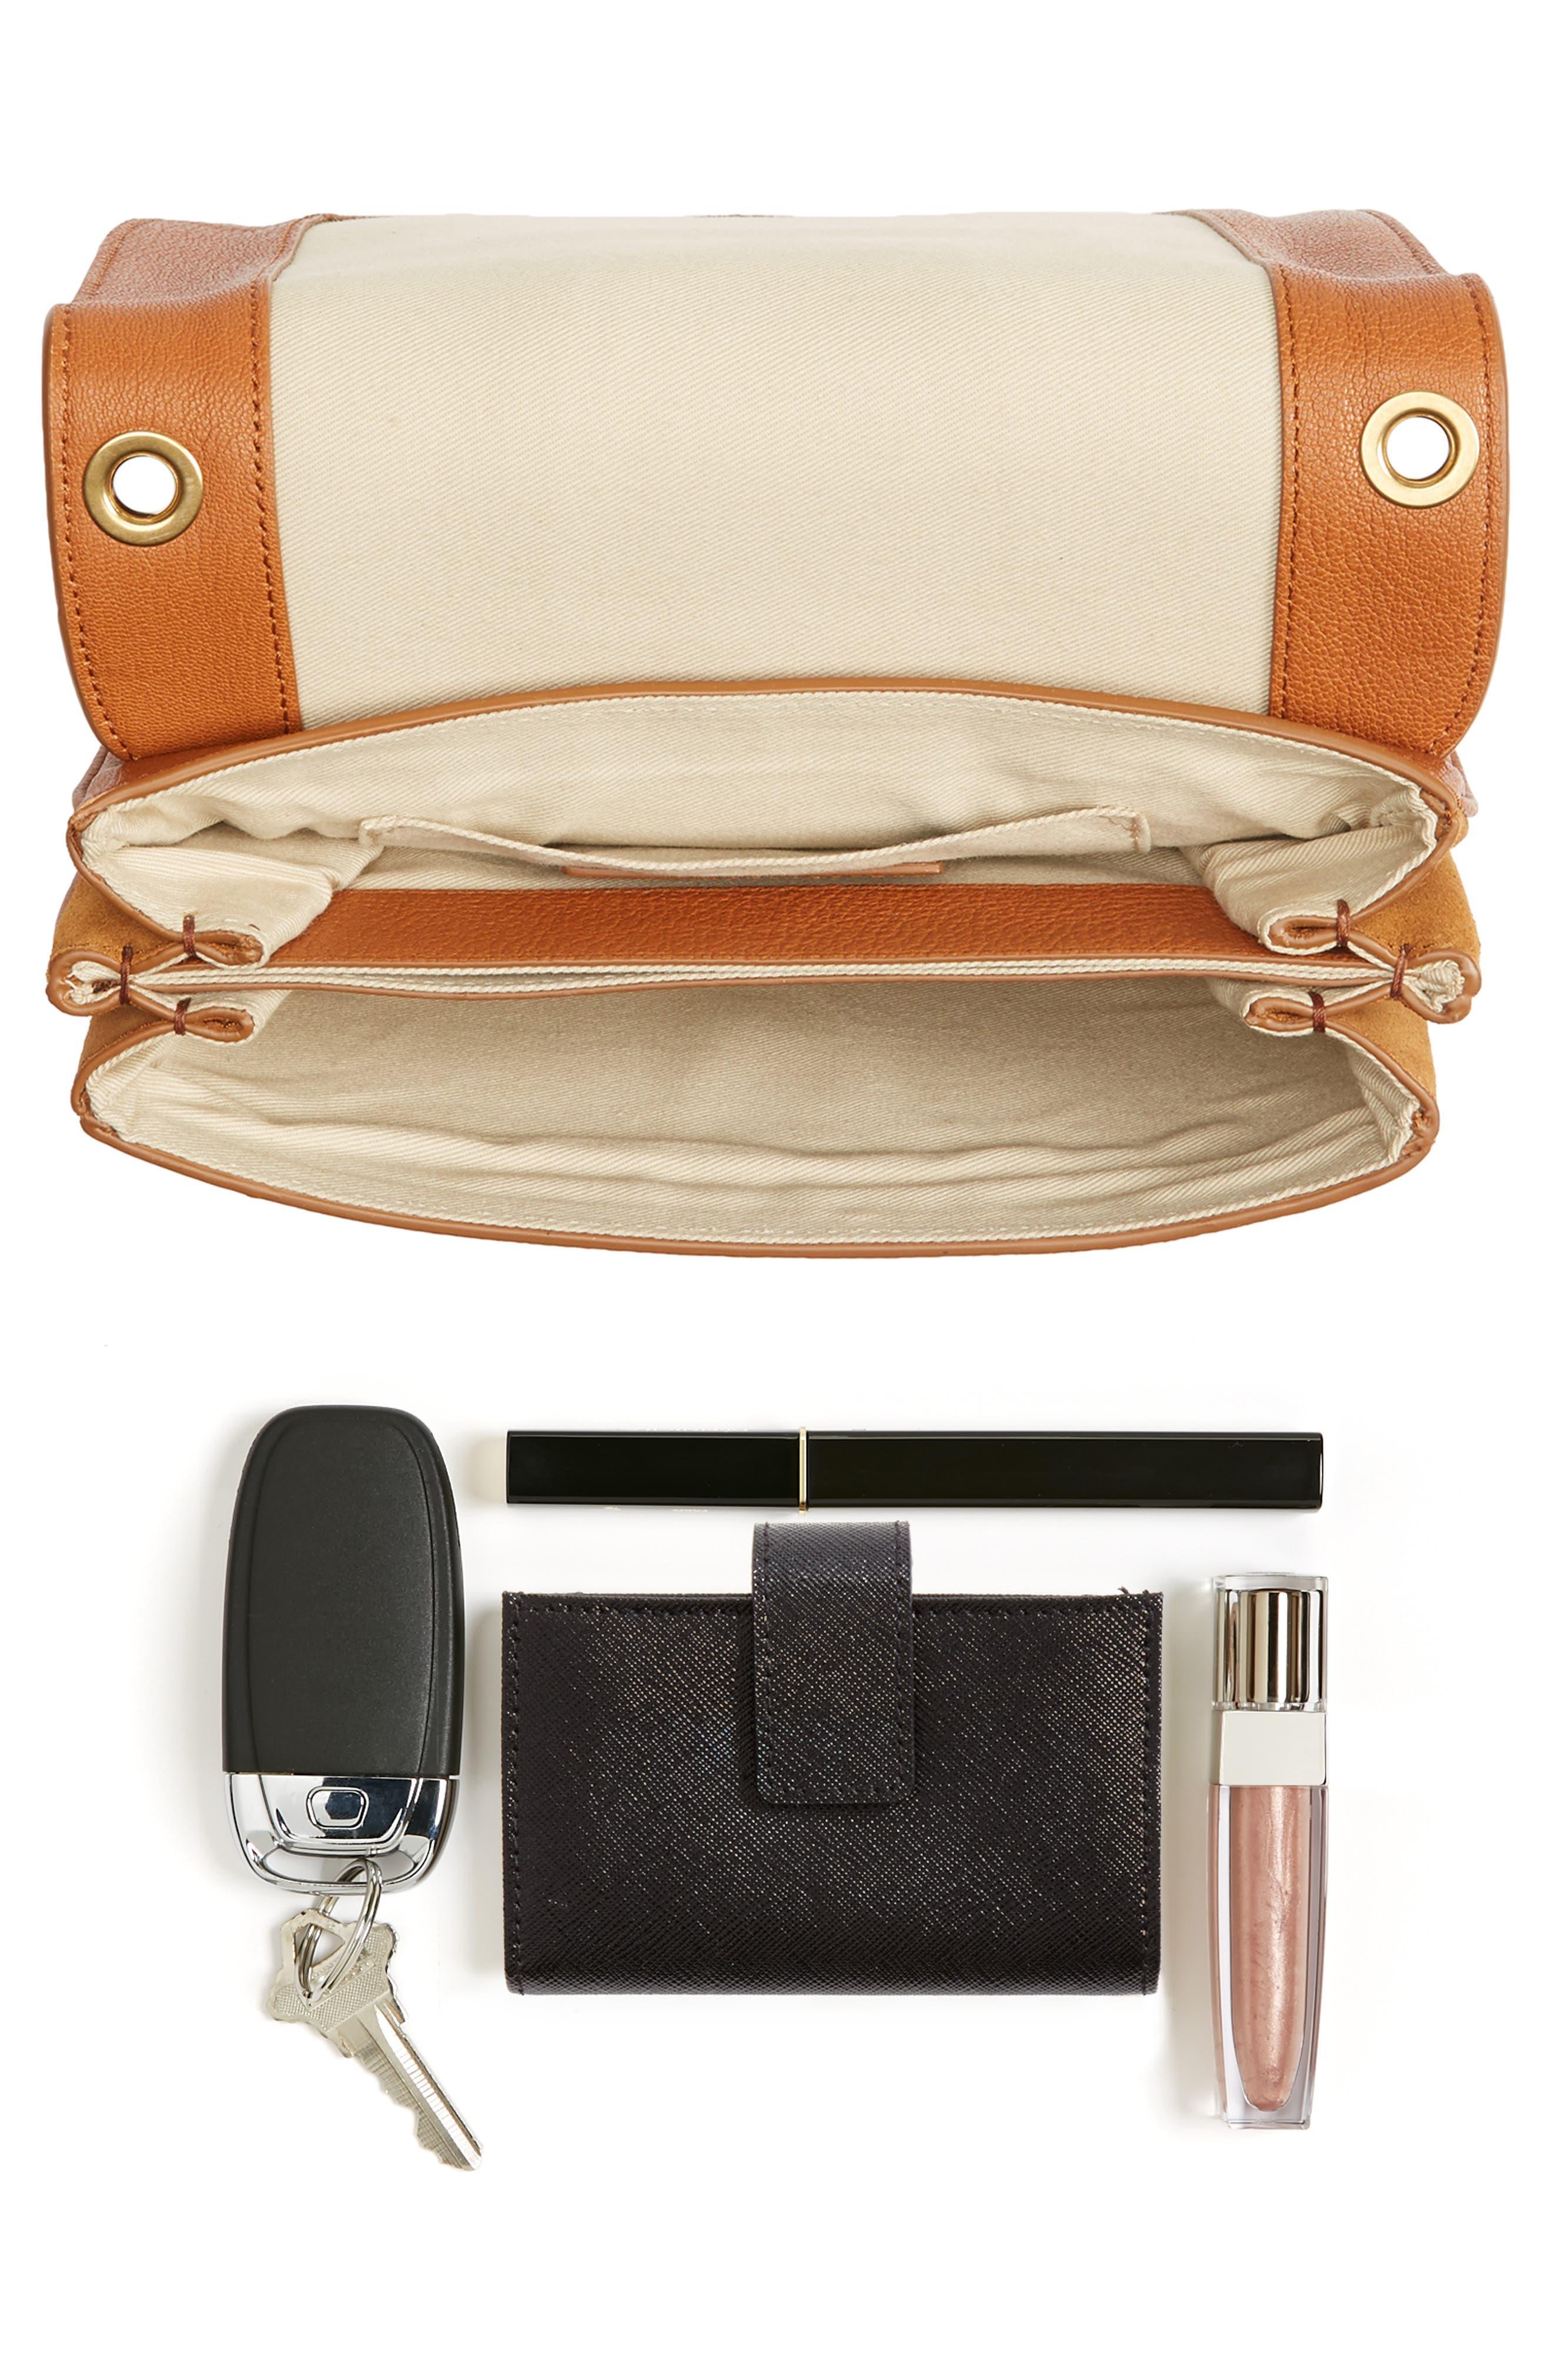 Hana Small Leather Crossbody Bag,                             Alternate thumbnail 5, color,